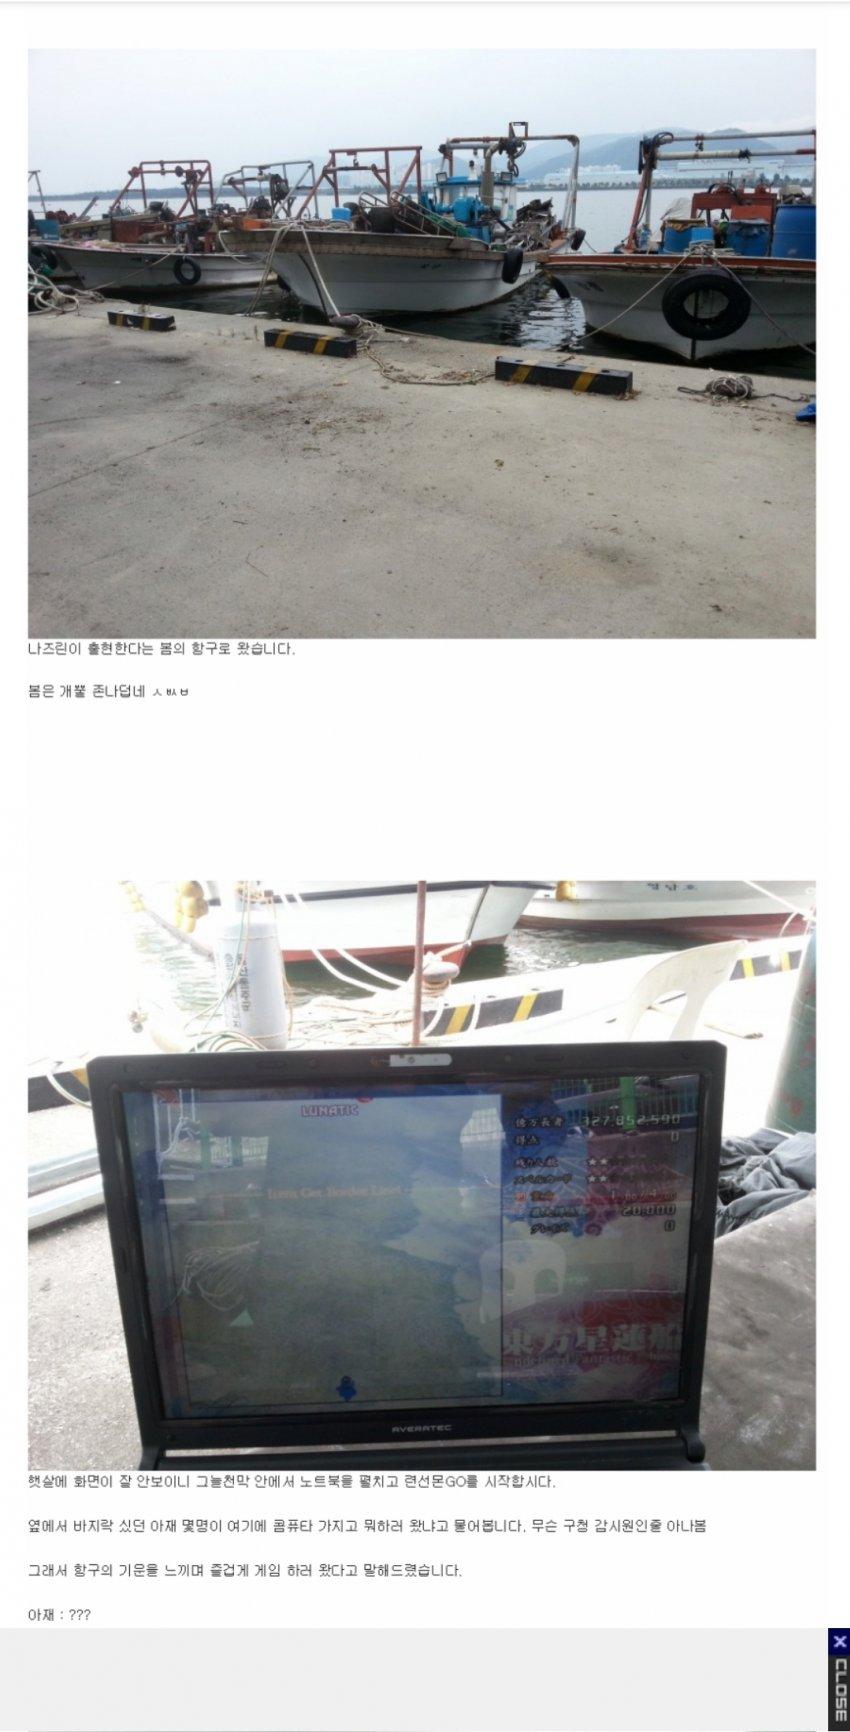 viewimage.php?id=39b2c52eeac7&no=24b0d769e1d32ca73dec8ffa11d02831046ced35d9c2bd23e7054f3c2d8b67af7396ccb3b1981eebaf49399748a61b717efb9b400b935ae545133a2801e1607ac58de2e0116fc513c9fb09eab28b48aa132bd4a83e3b02ee02899b12b51e101a3d11abfcb2983f